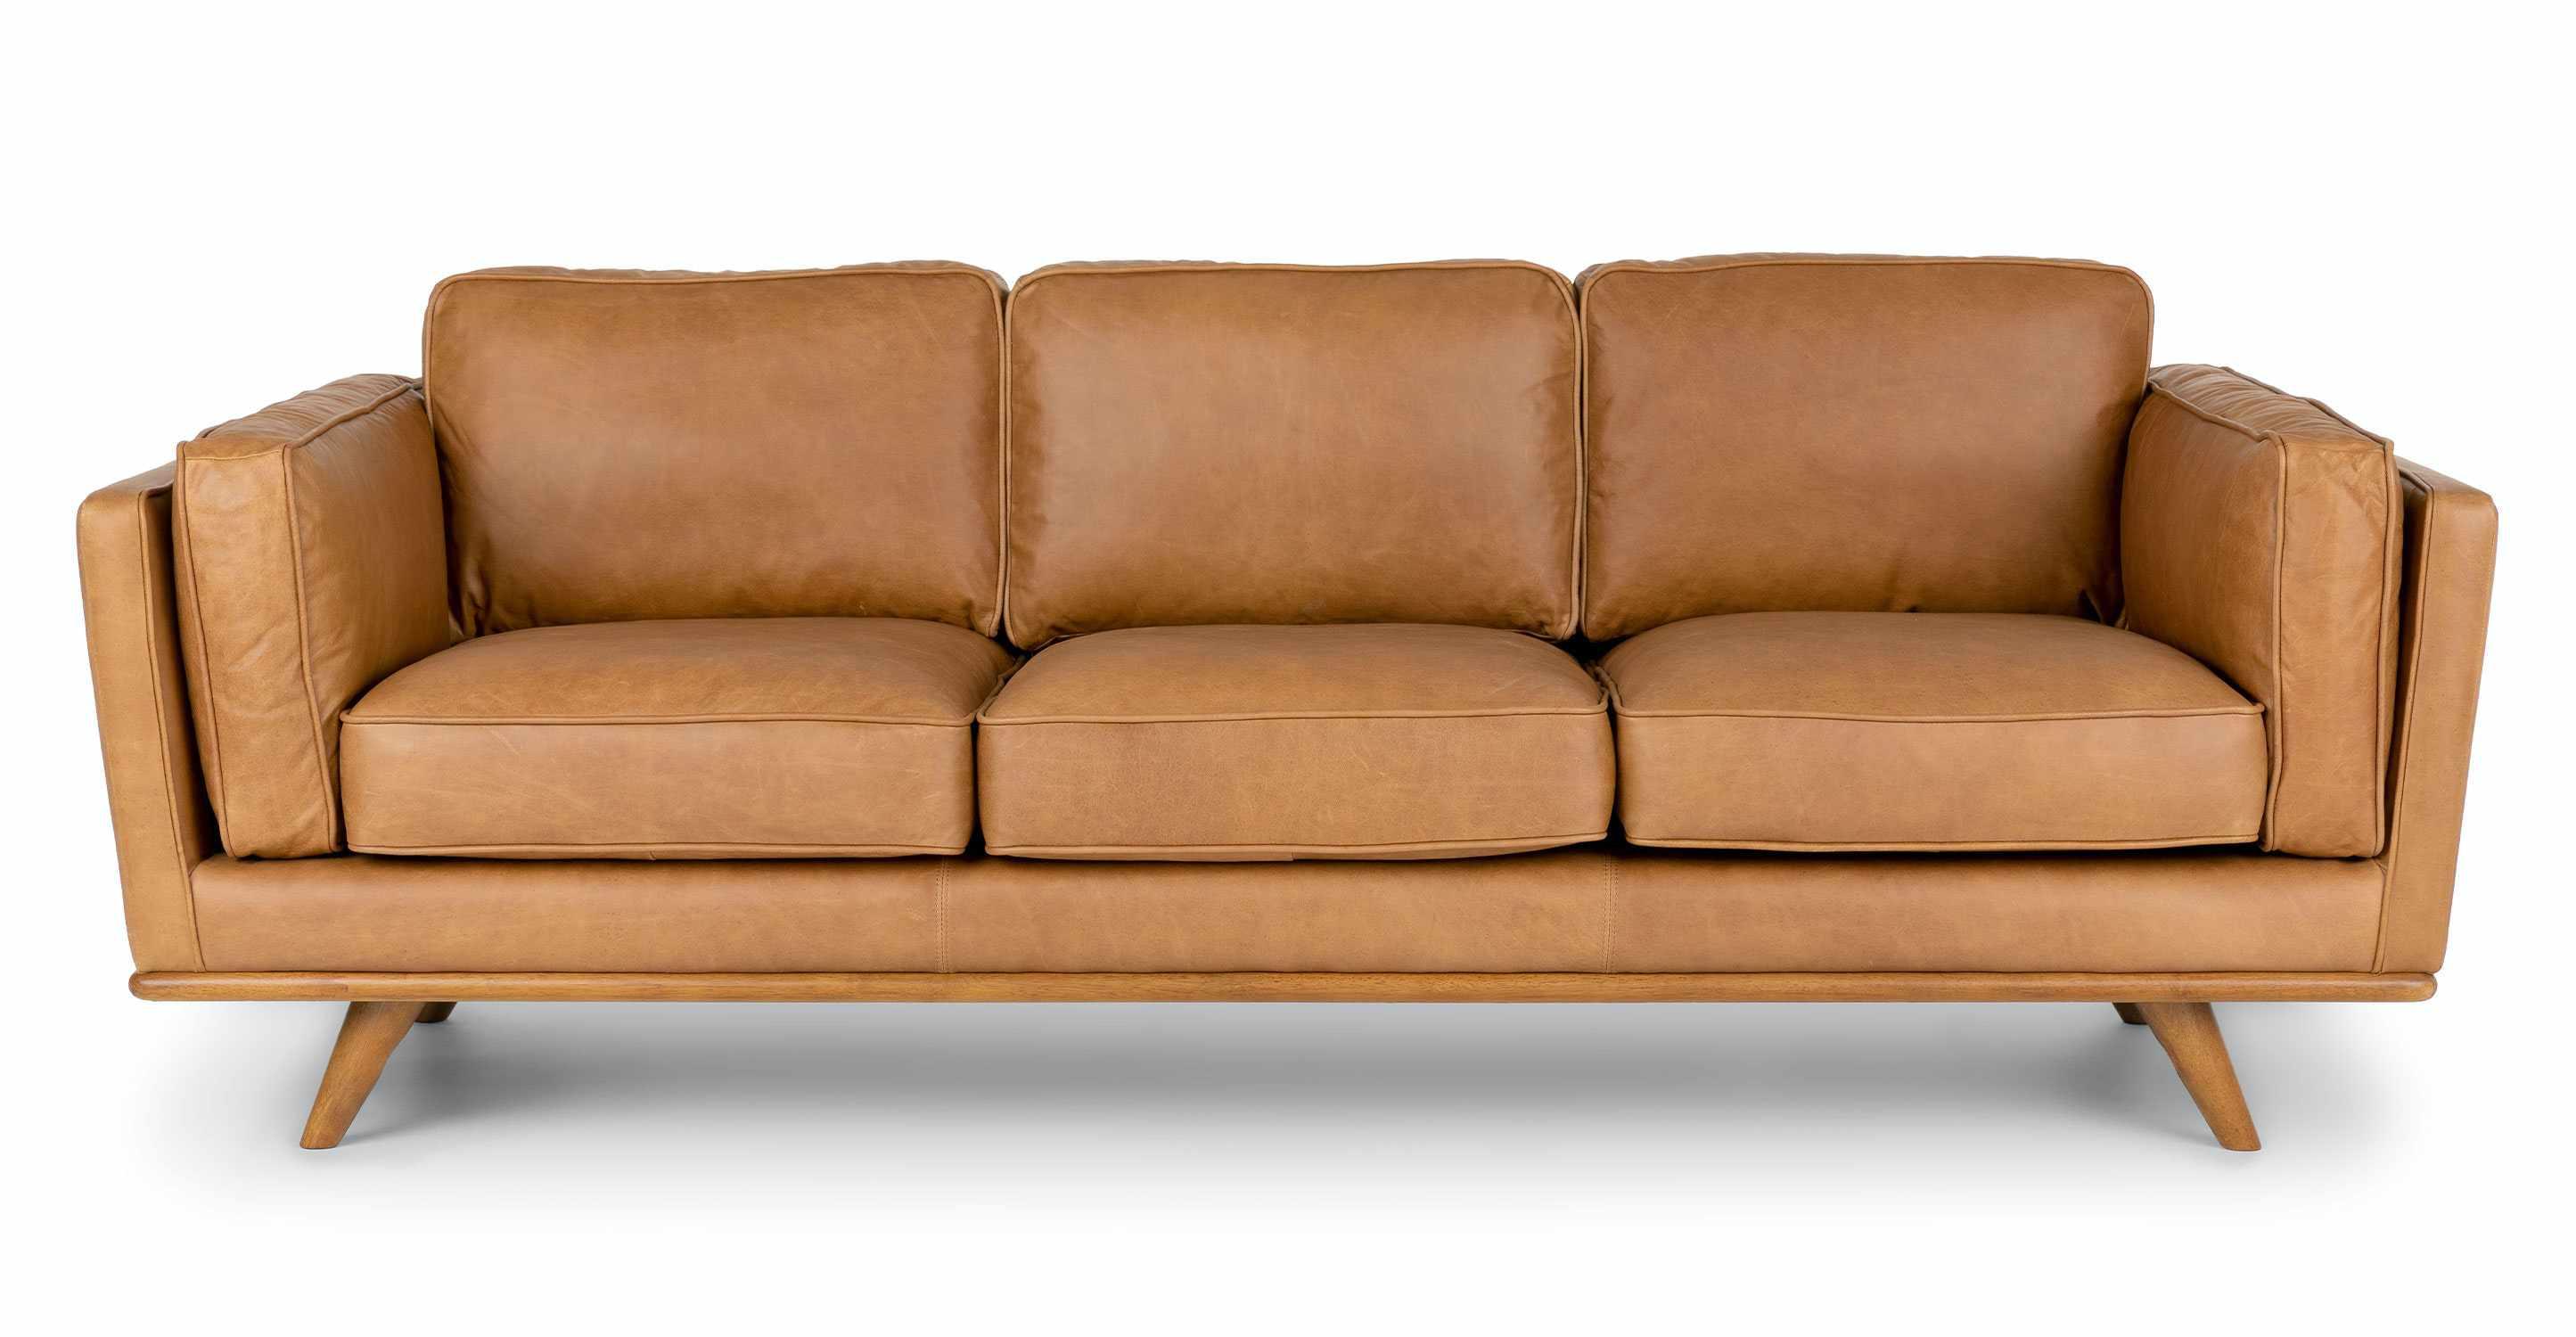 Article Timber Charme Sofa